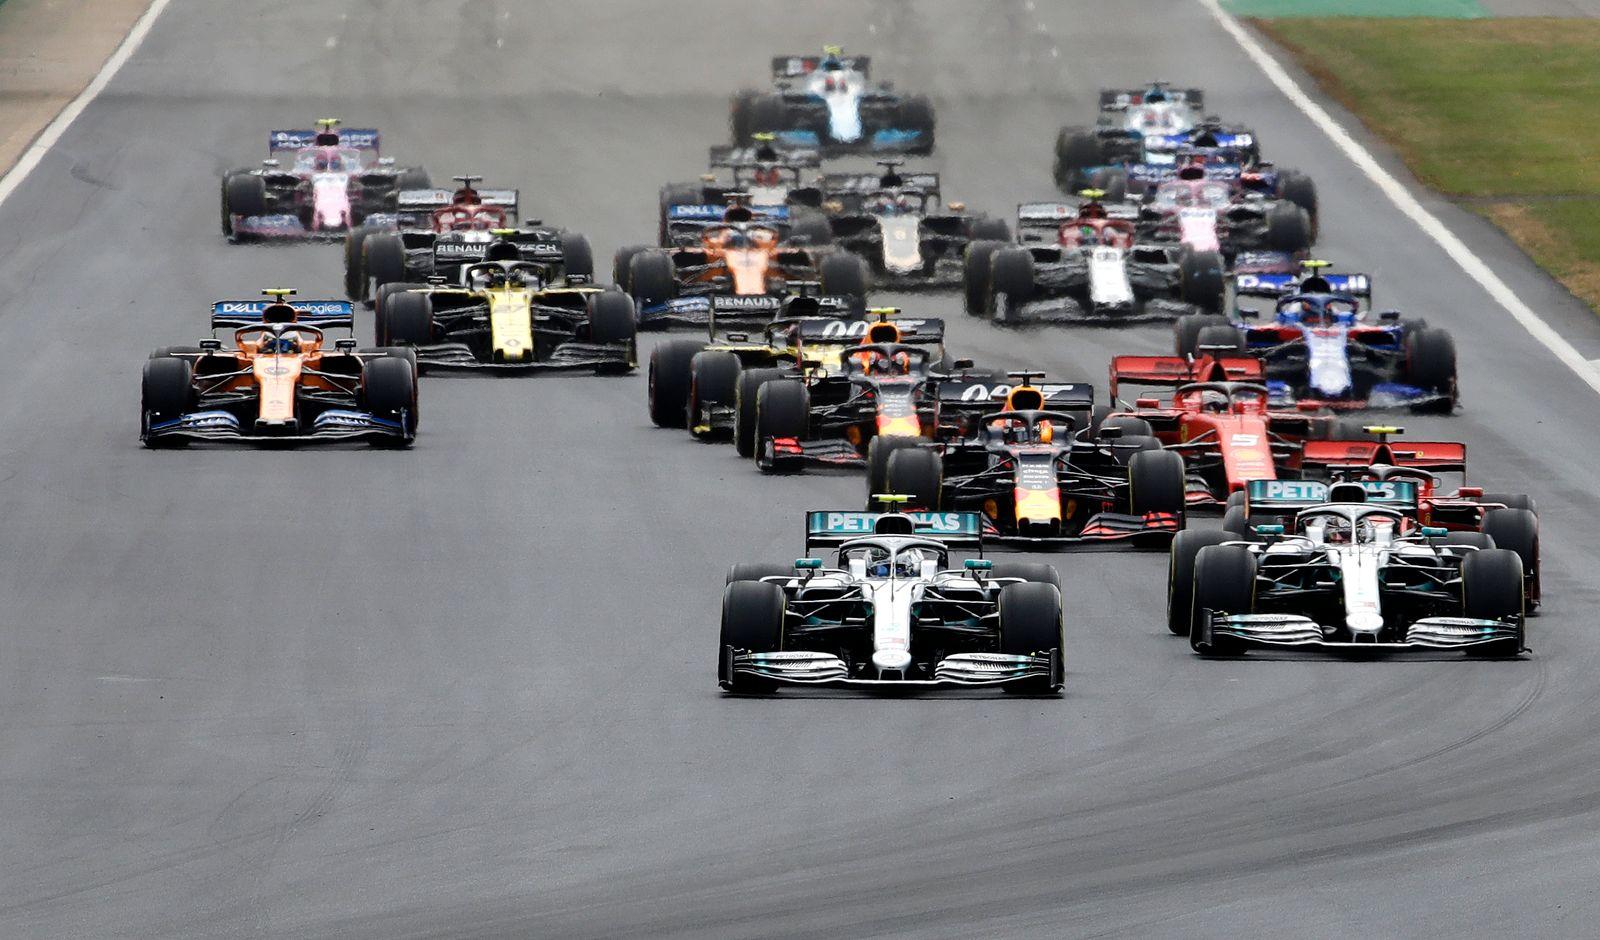 Formel-1 - Silverstone